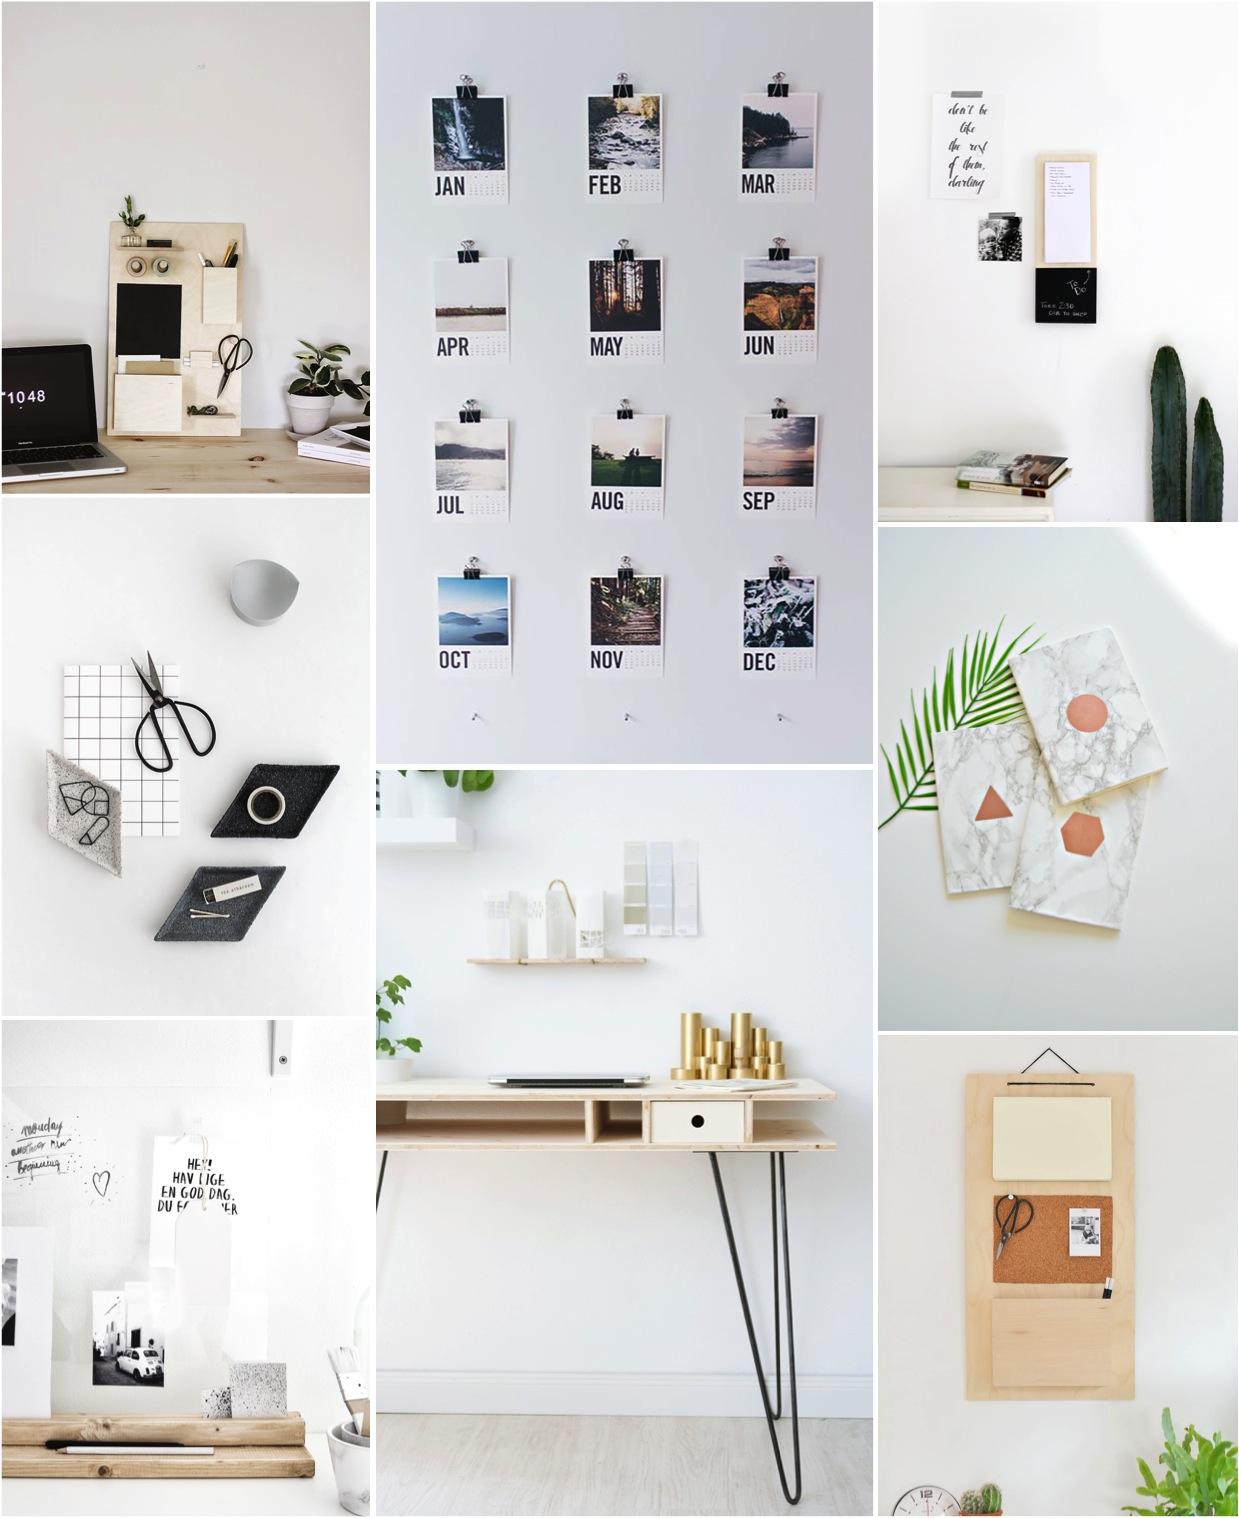 - 8 DIY Desk Organization Ideas For A Small Home Office - DIY Home